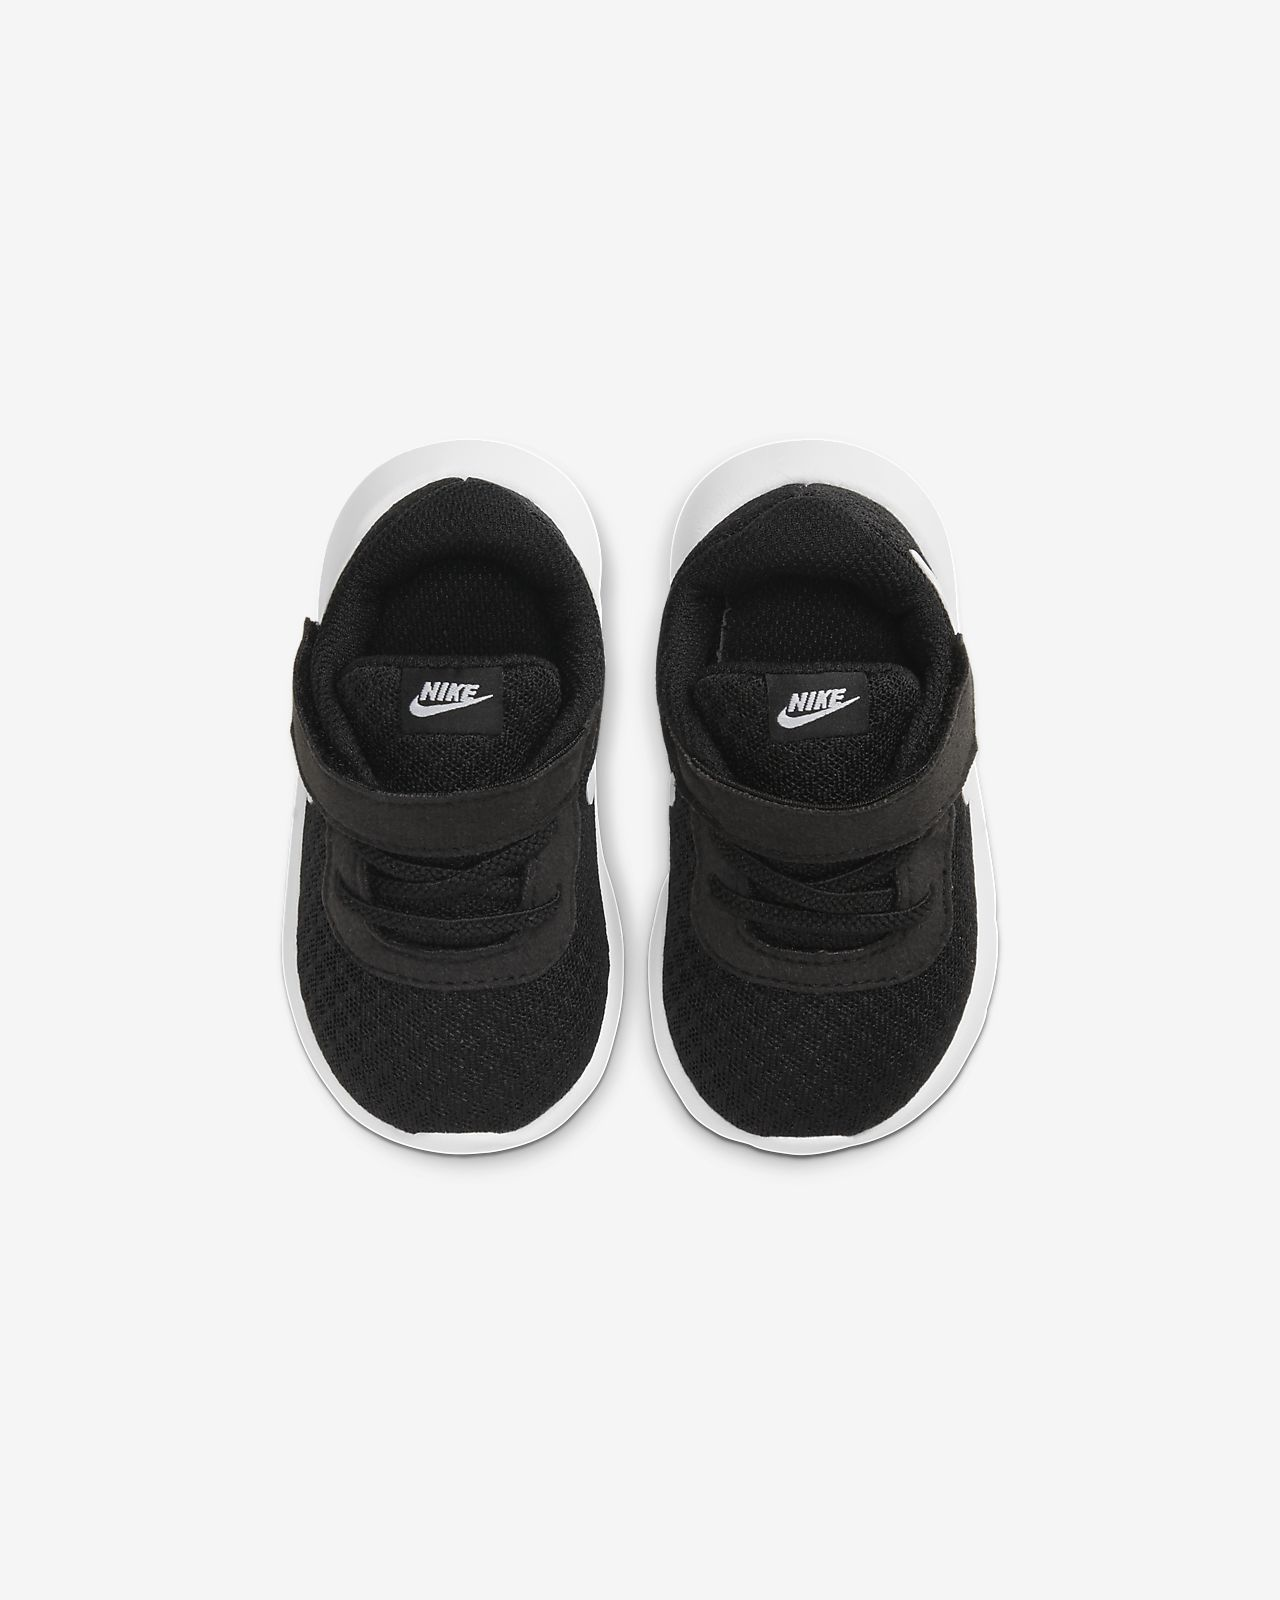 zapatillas niño 27 nike